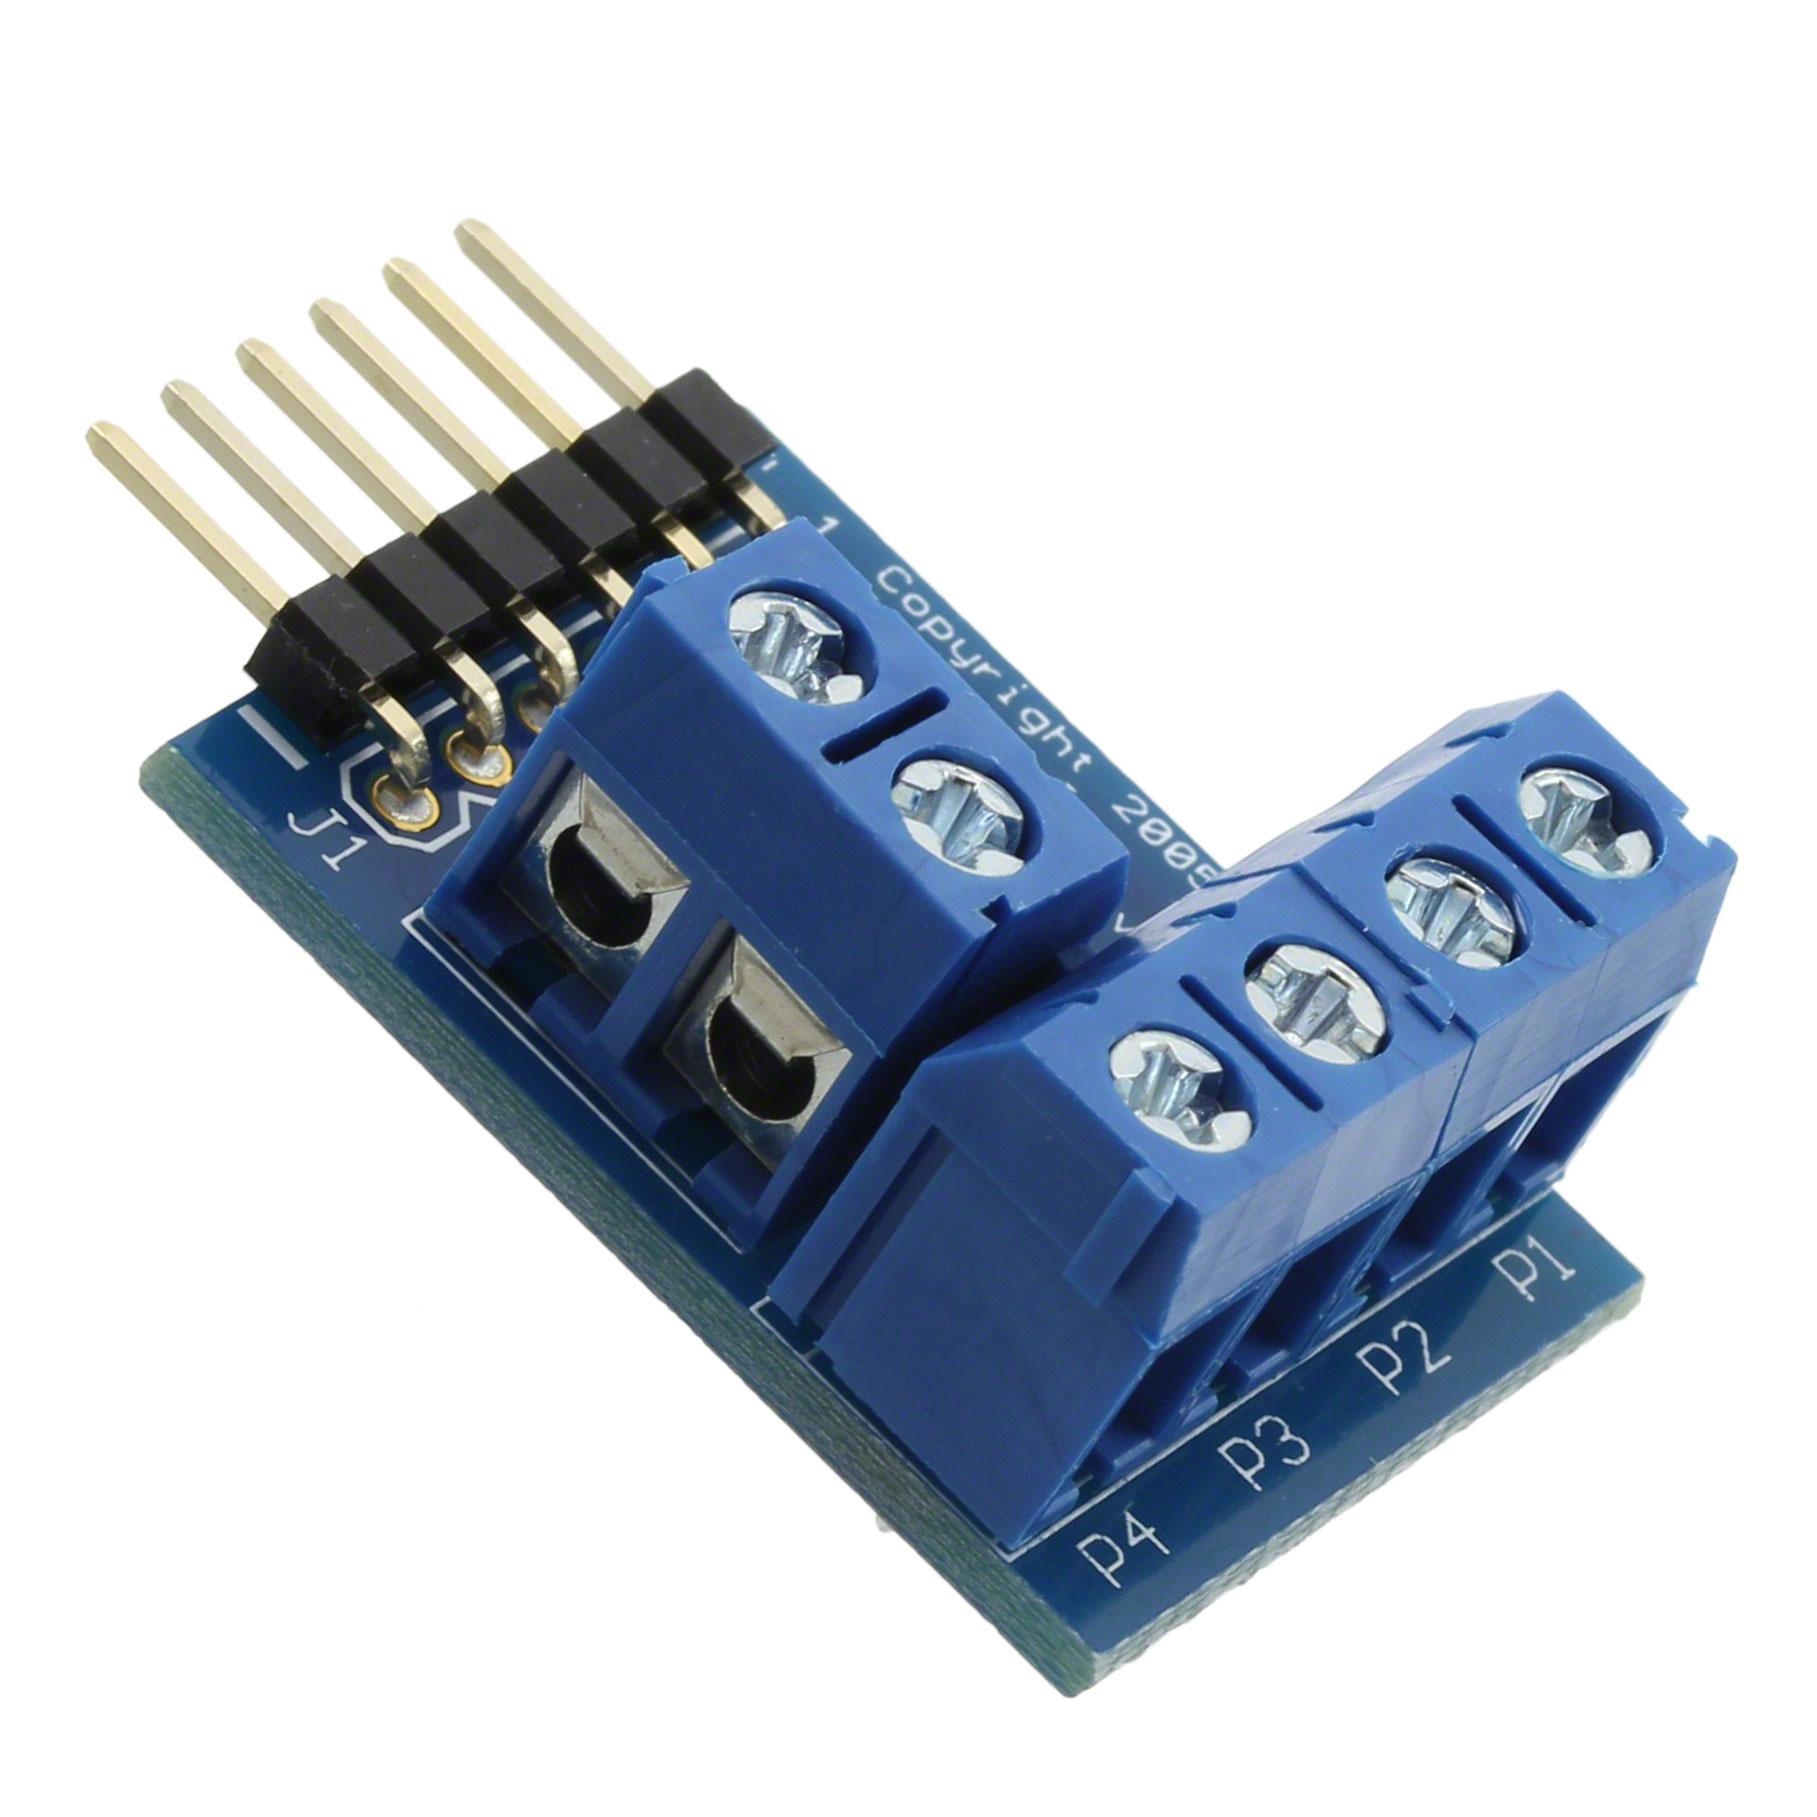 Combination Lock Using Msp430 Launchpad Circuit Image